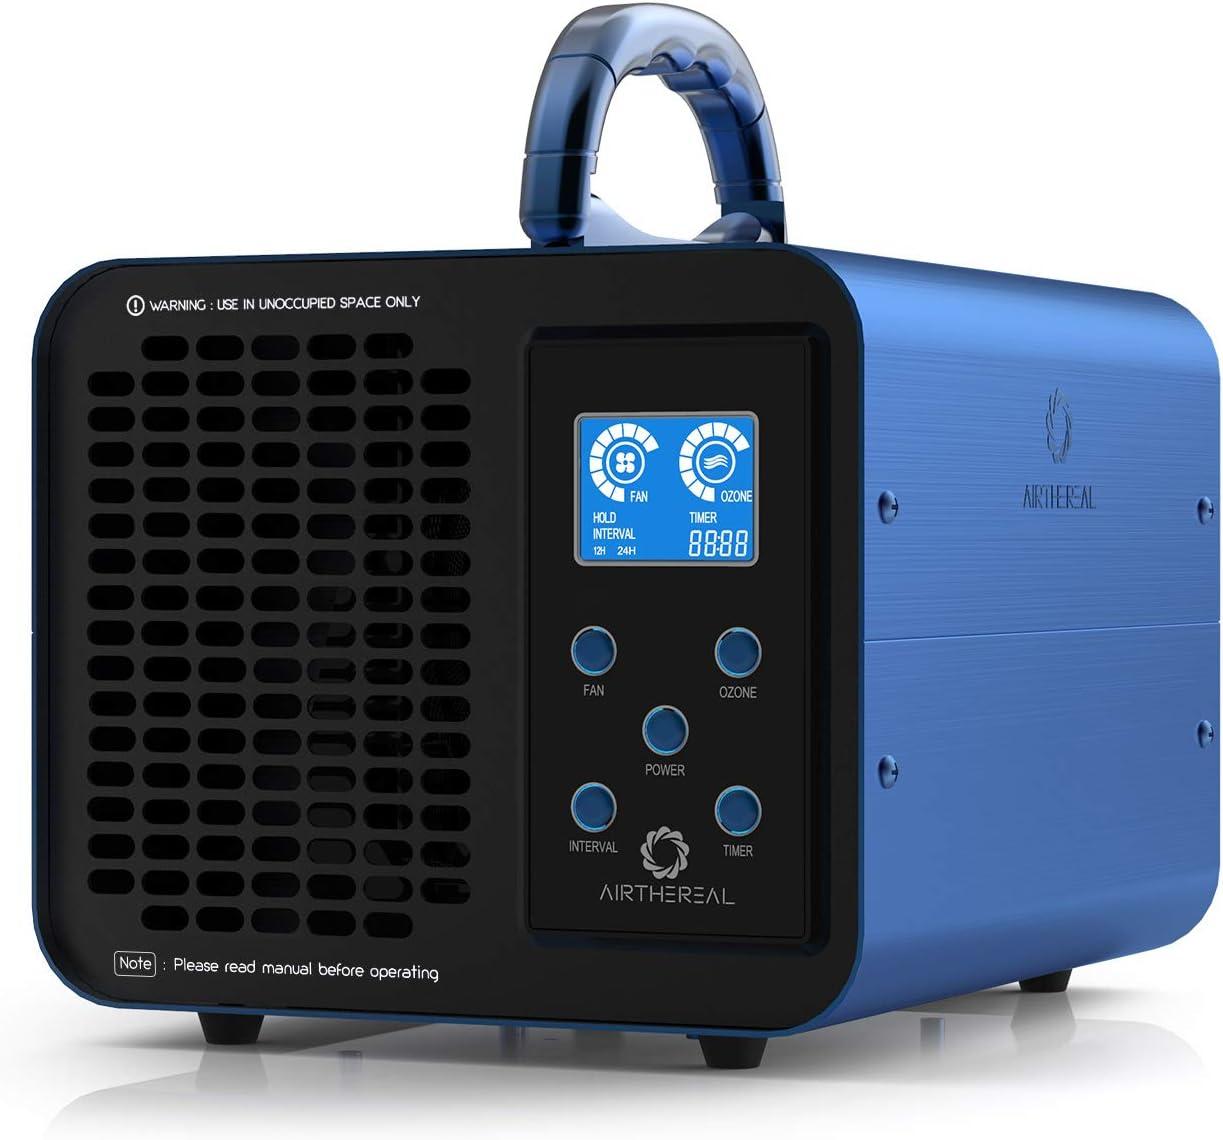 Airthereal Ma10k Prodigi Digital Ozone Generator 10 000 Mg H O3 Machine Home Air Ioniser Deodorant Adjustable For All Room Sizes Amazon De Kuche Haushalt